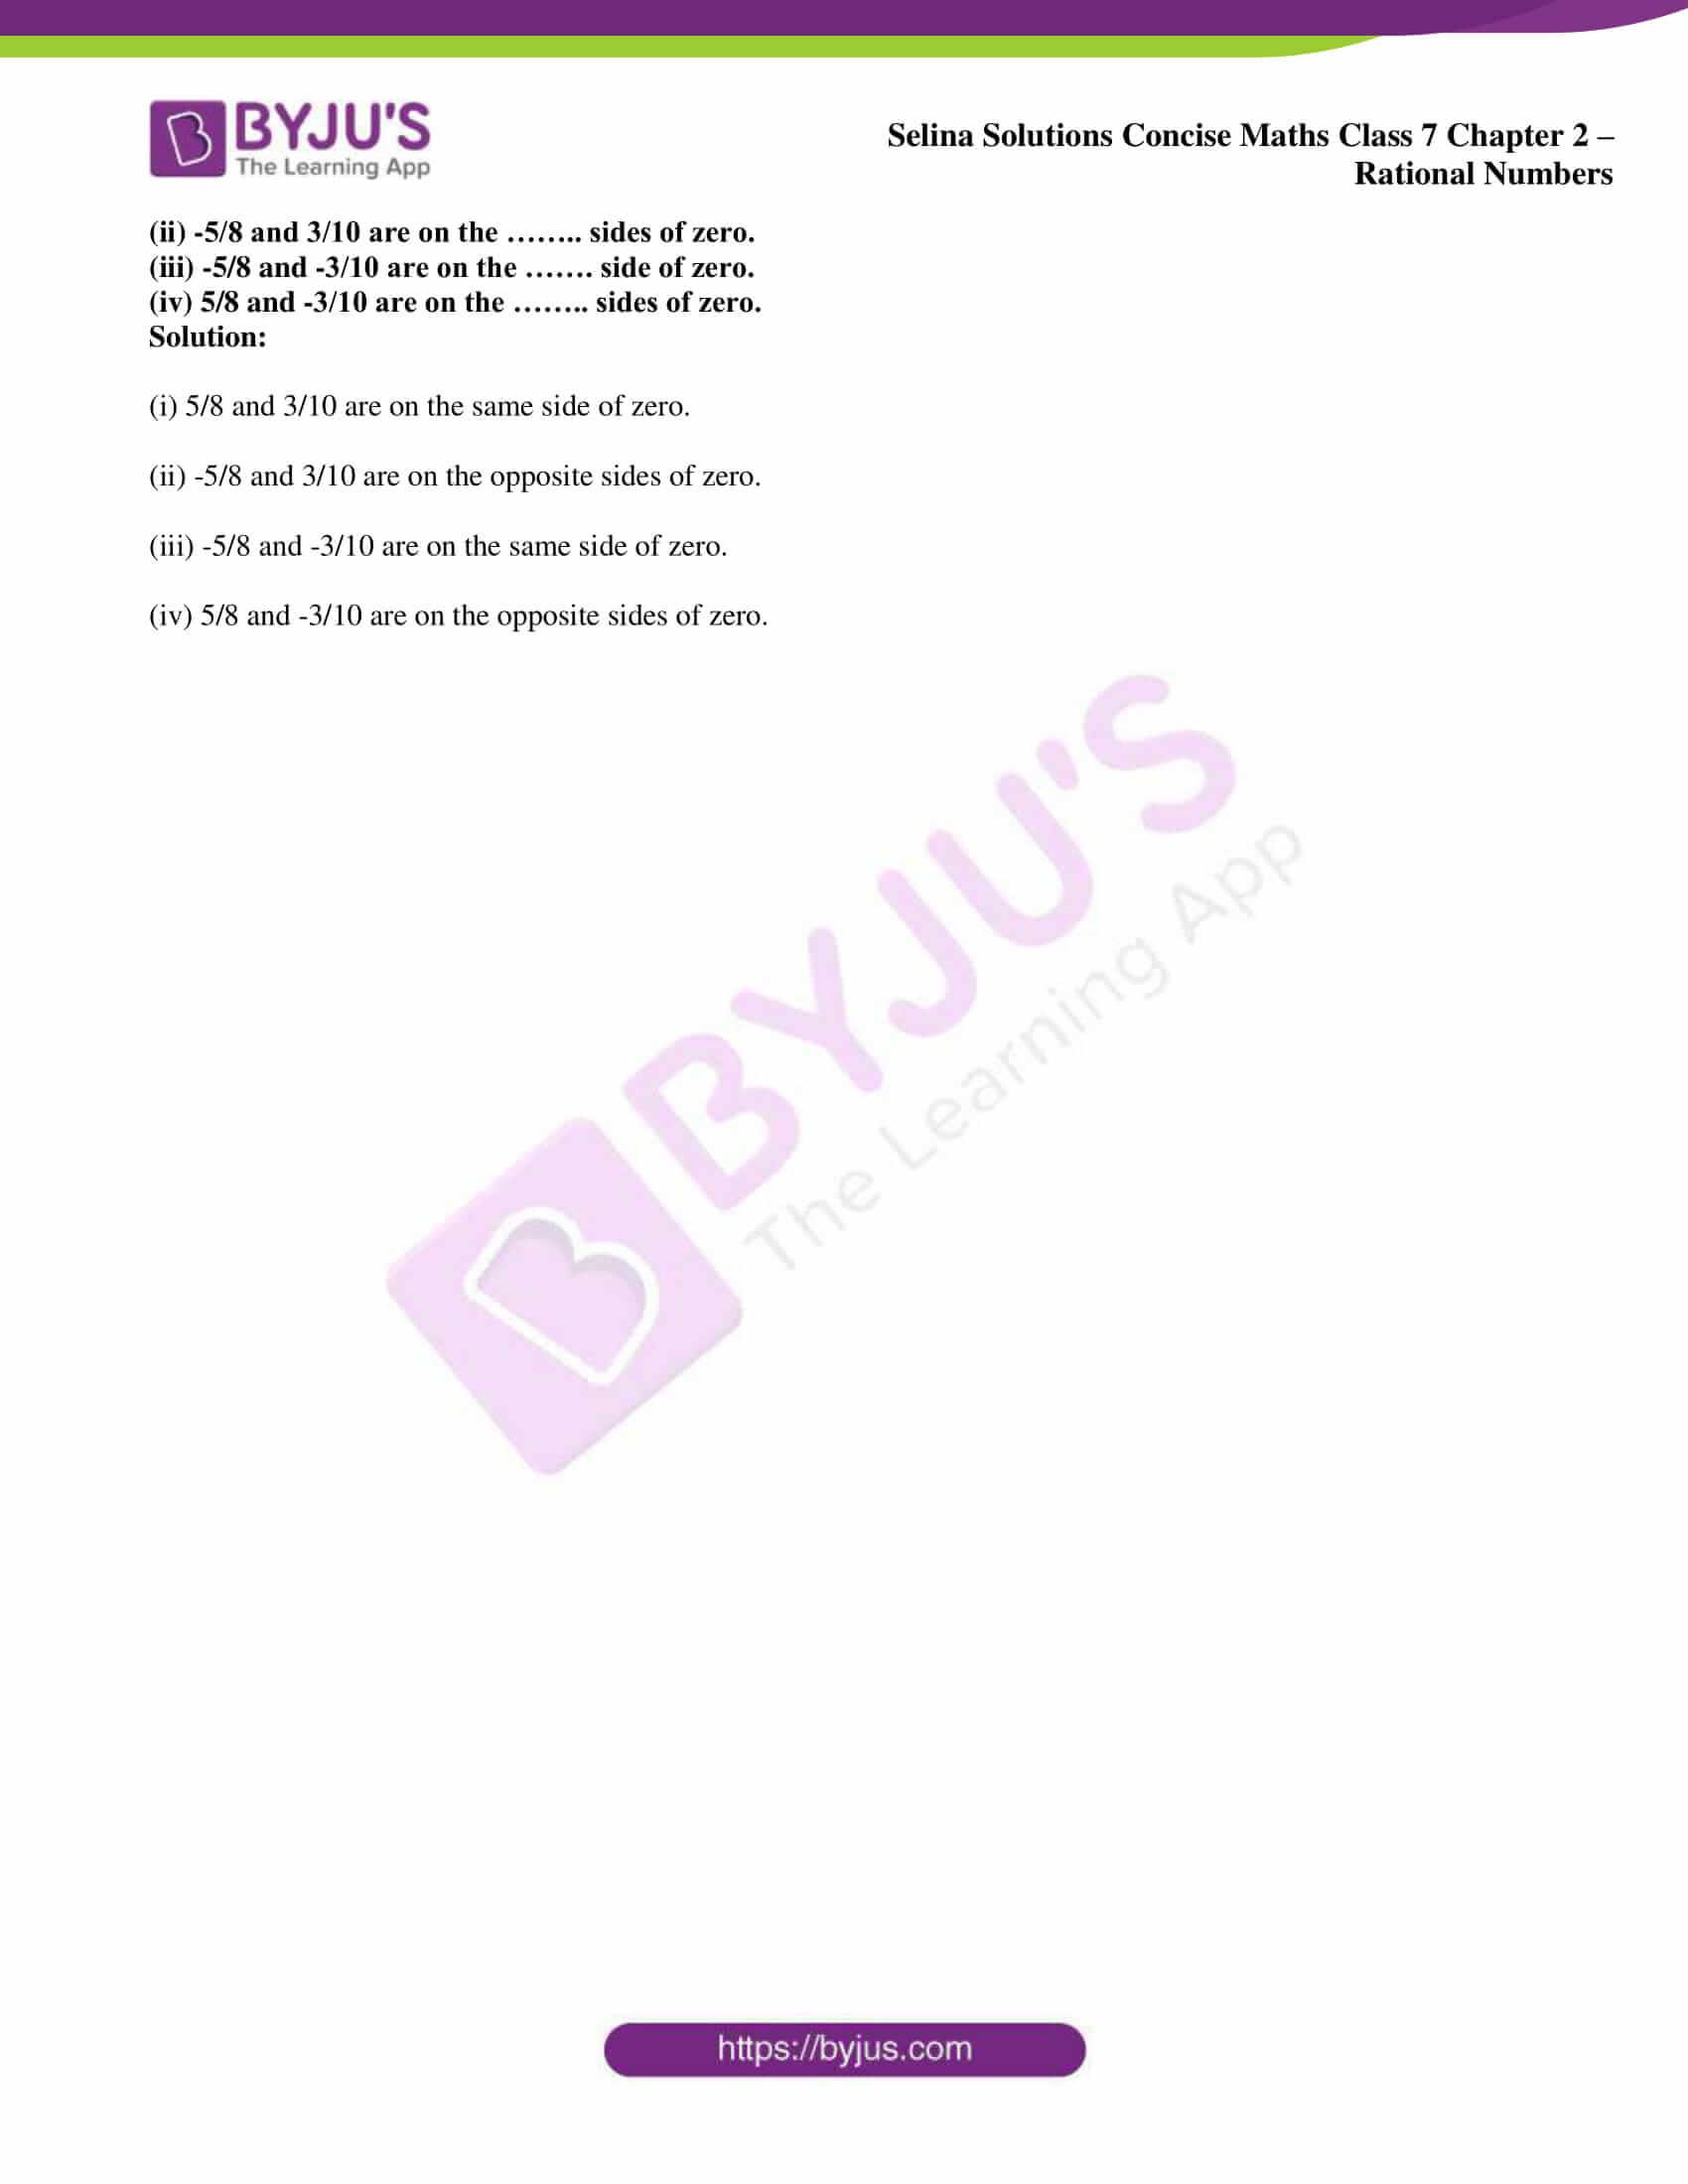 selina sol concise maths class 7 ch2 ex 2b 6